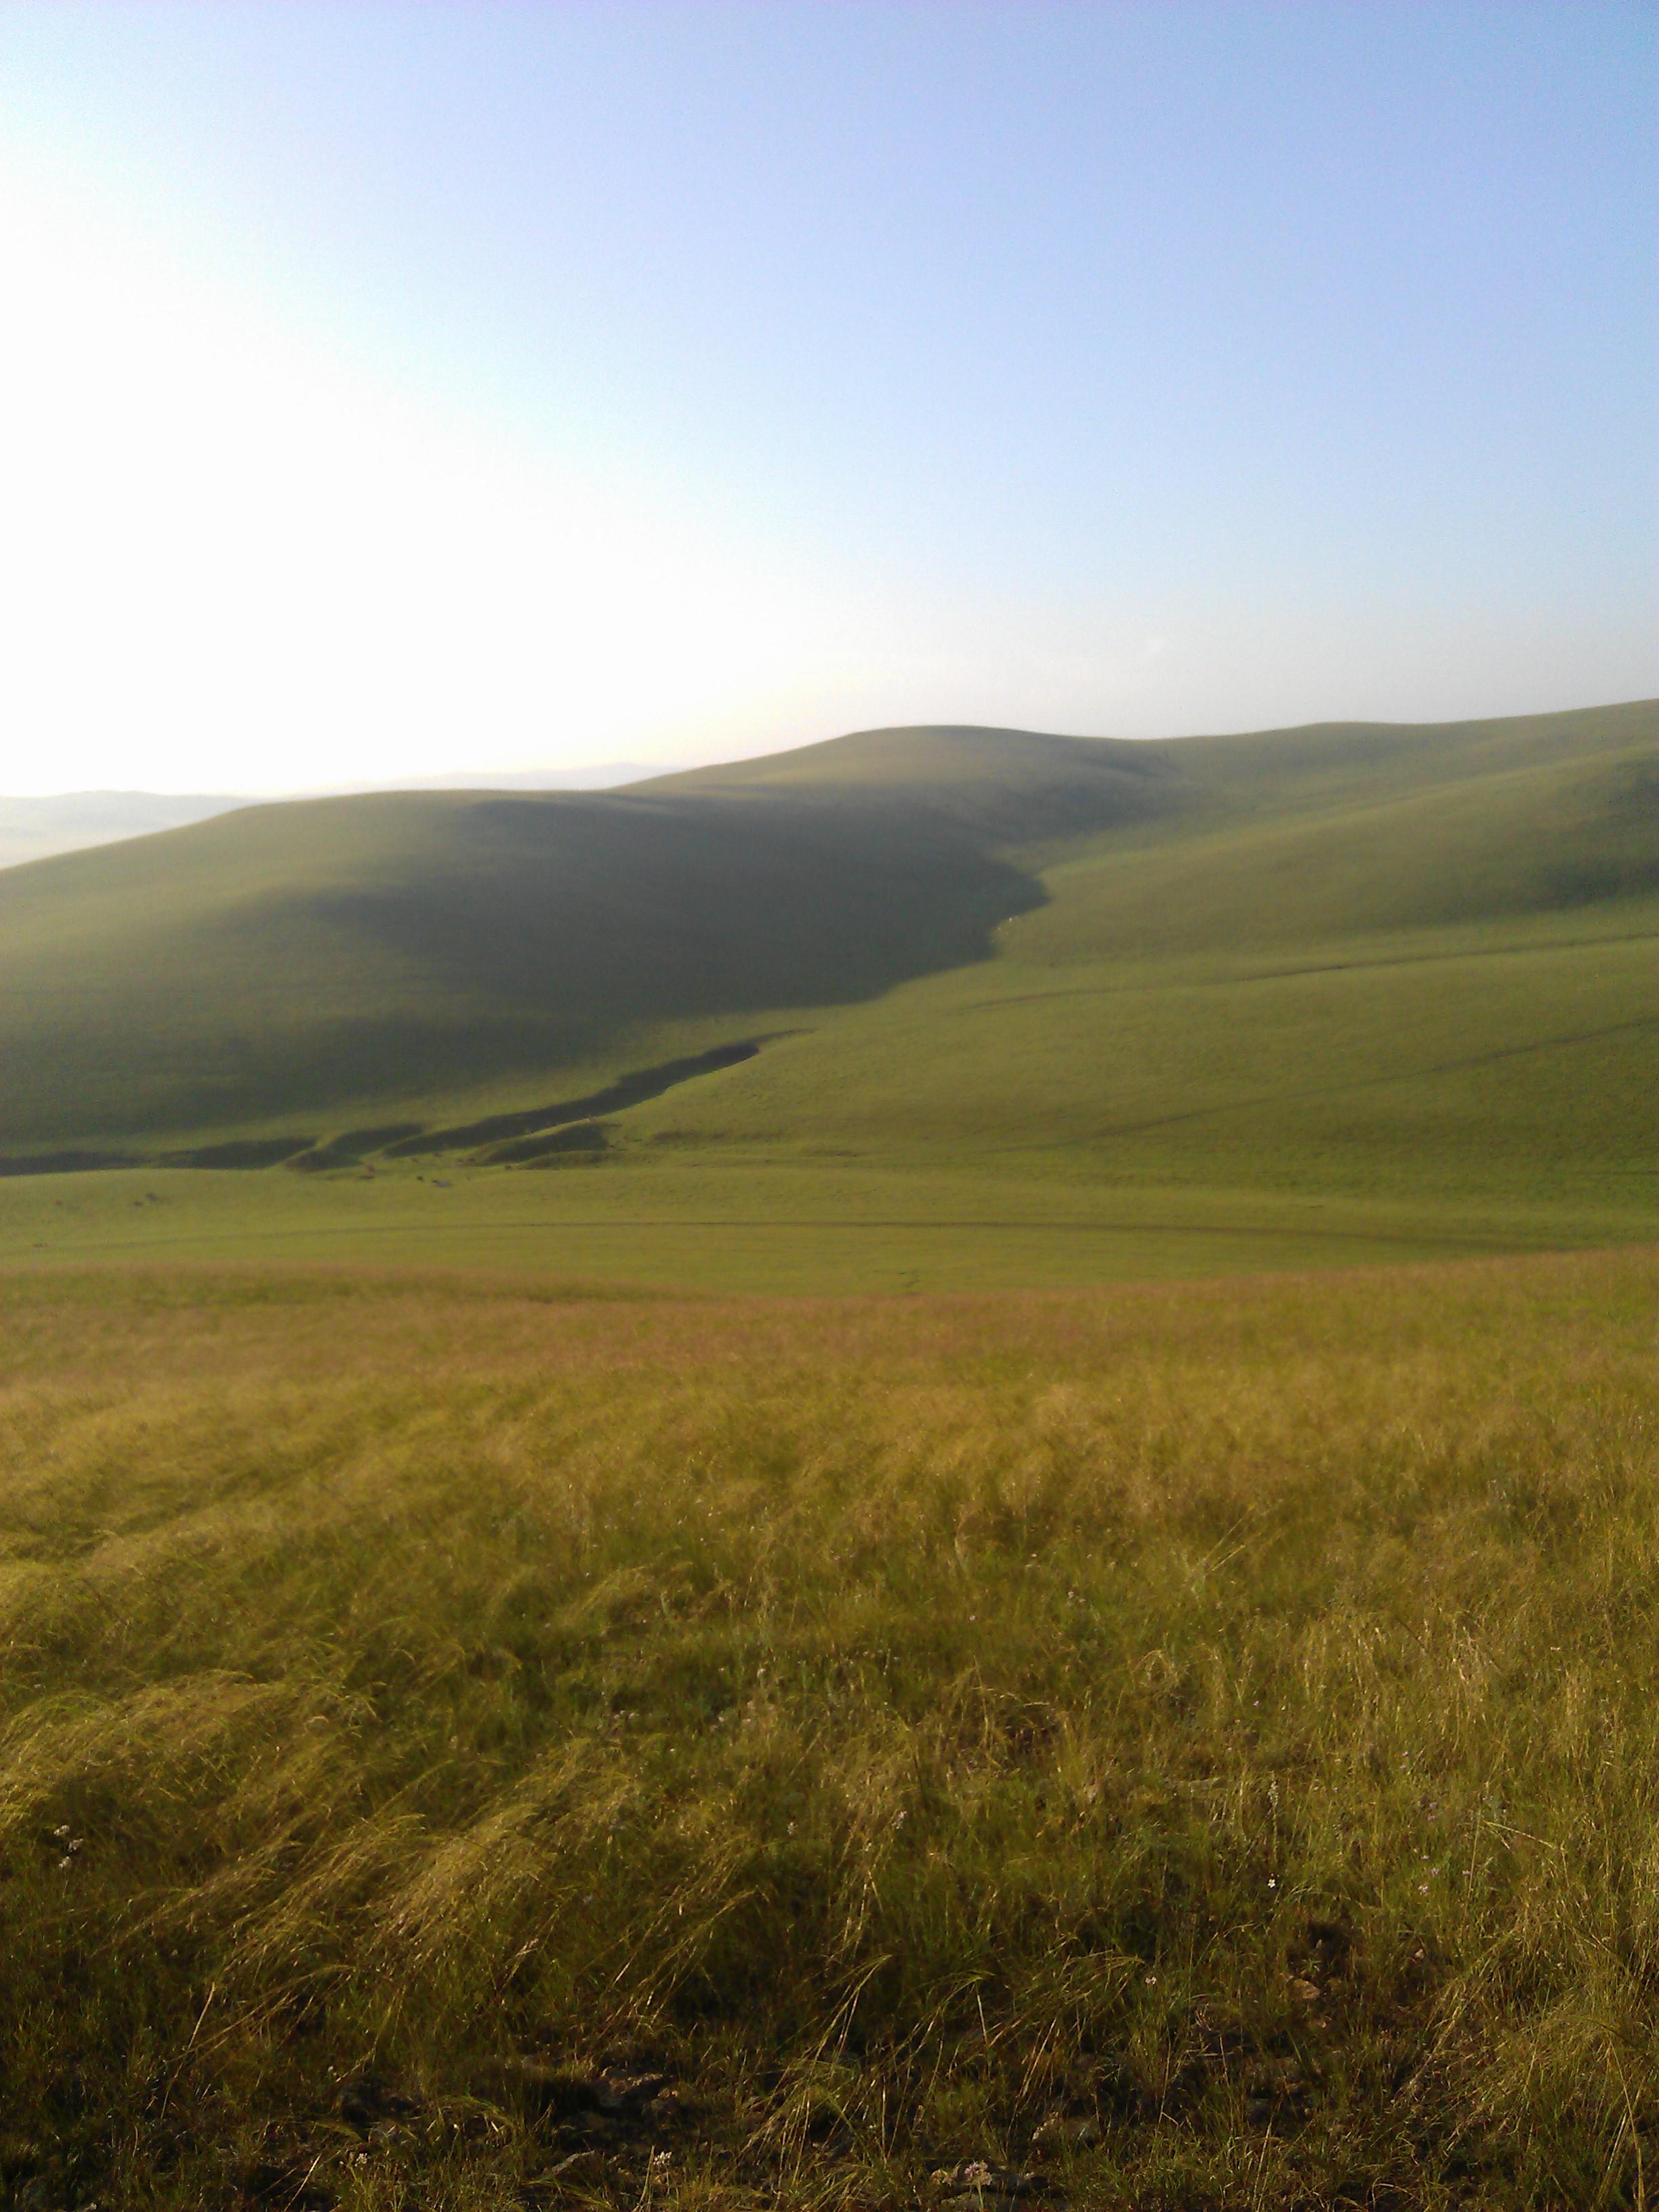 Tongliao inner mongolia dating